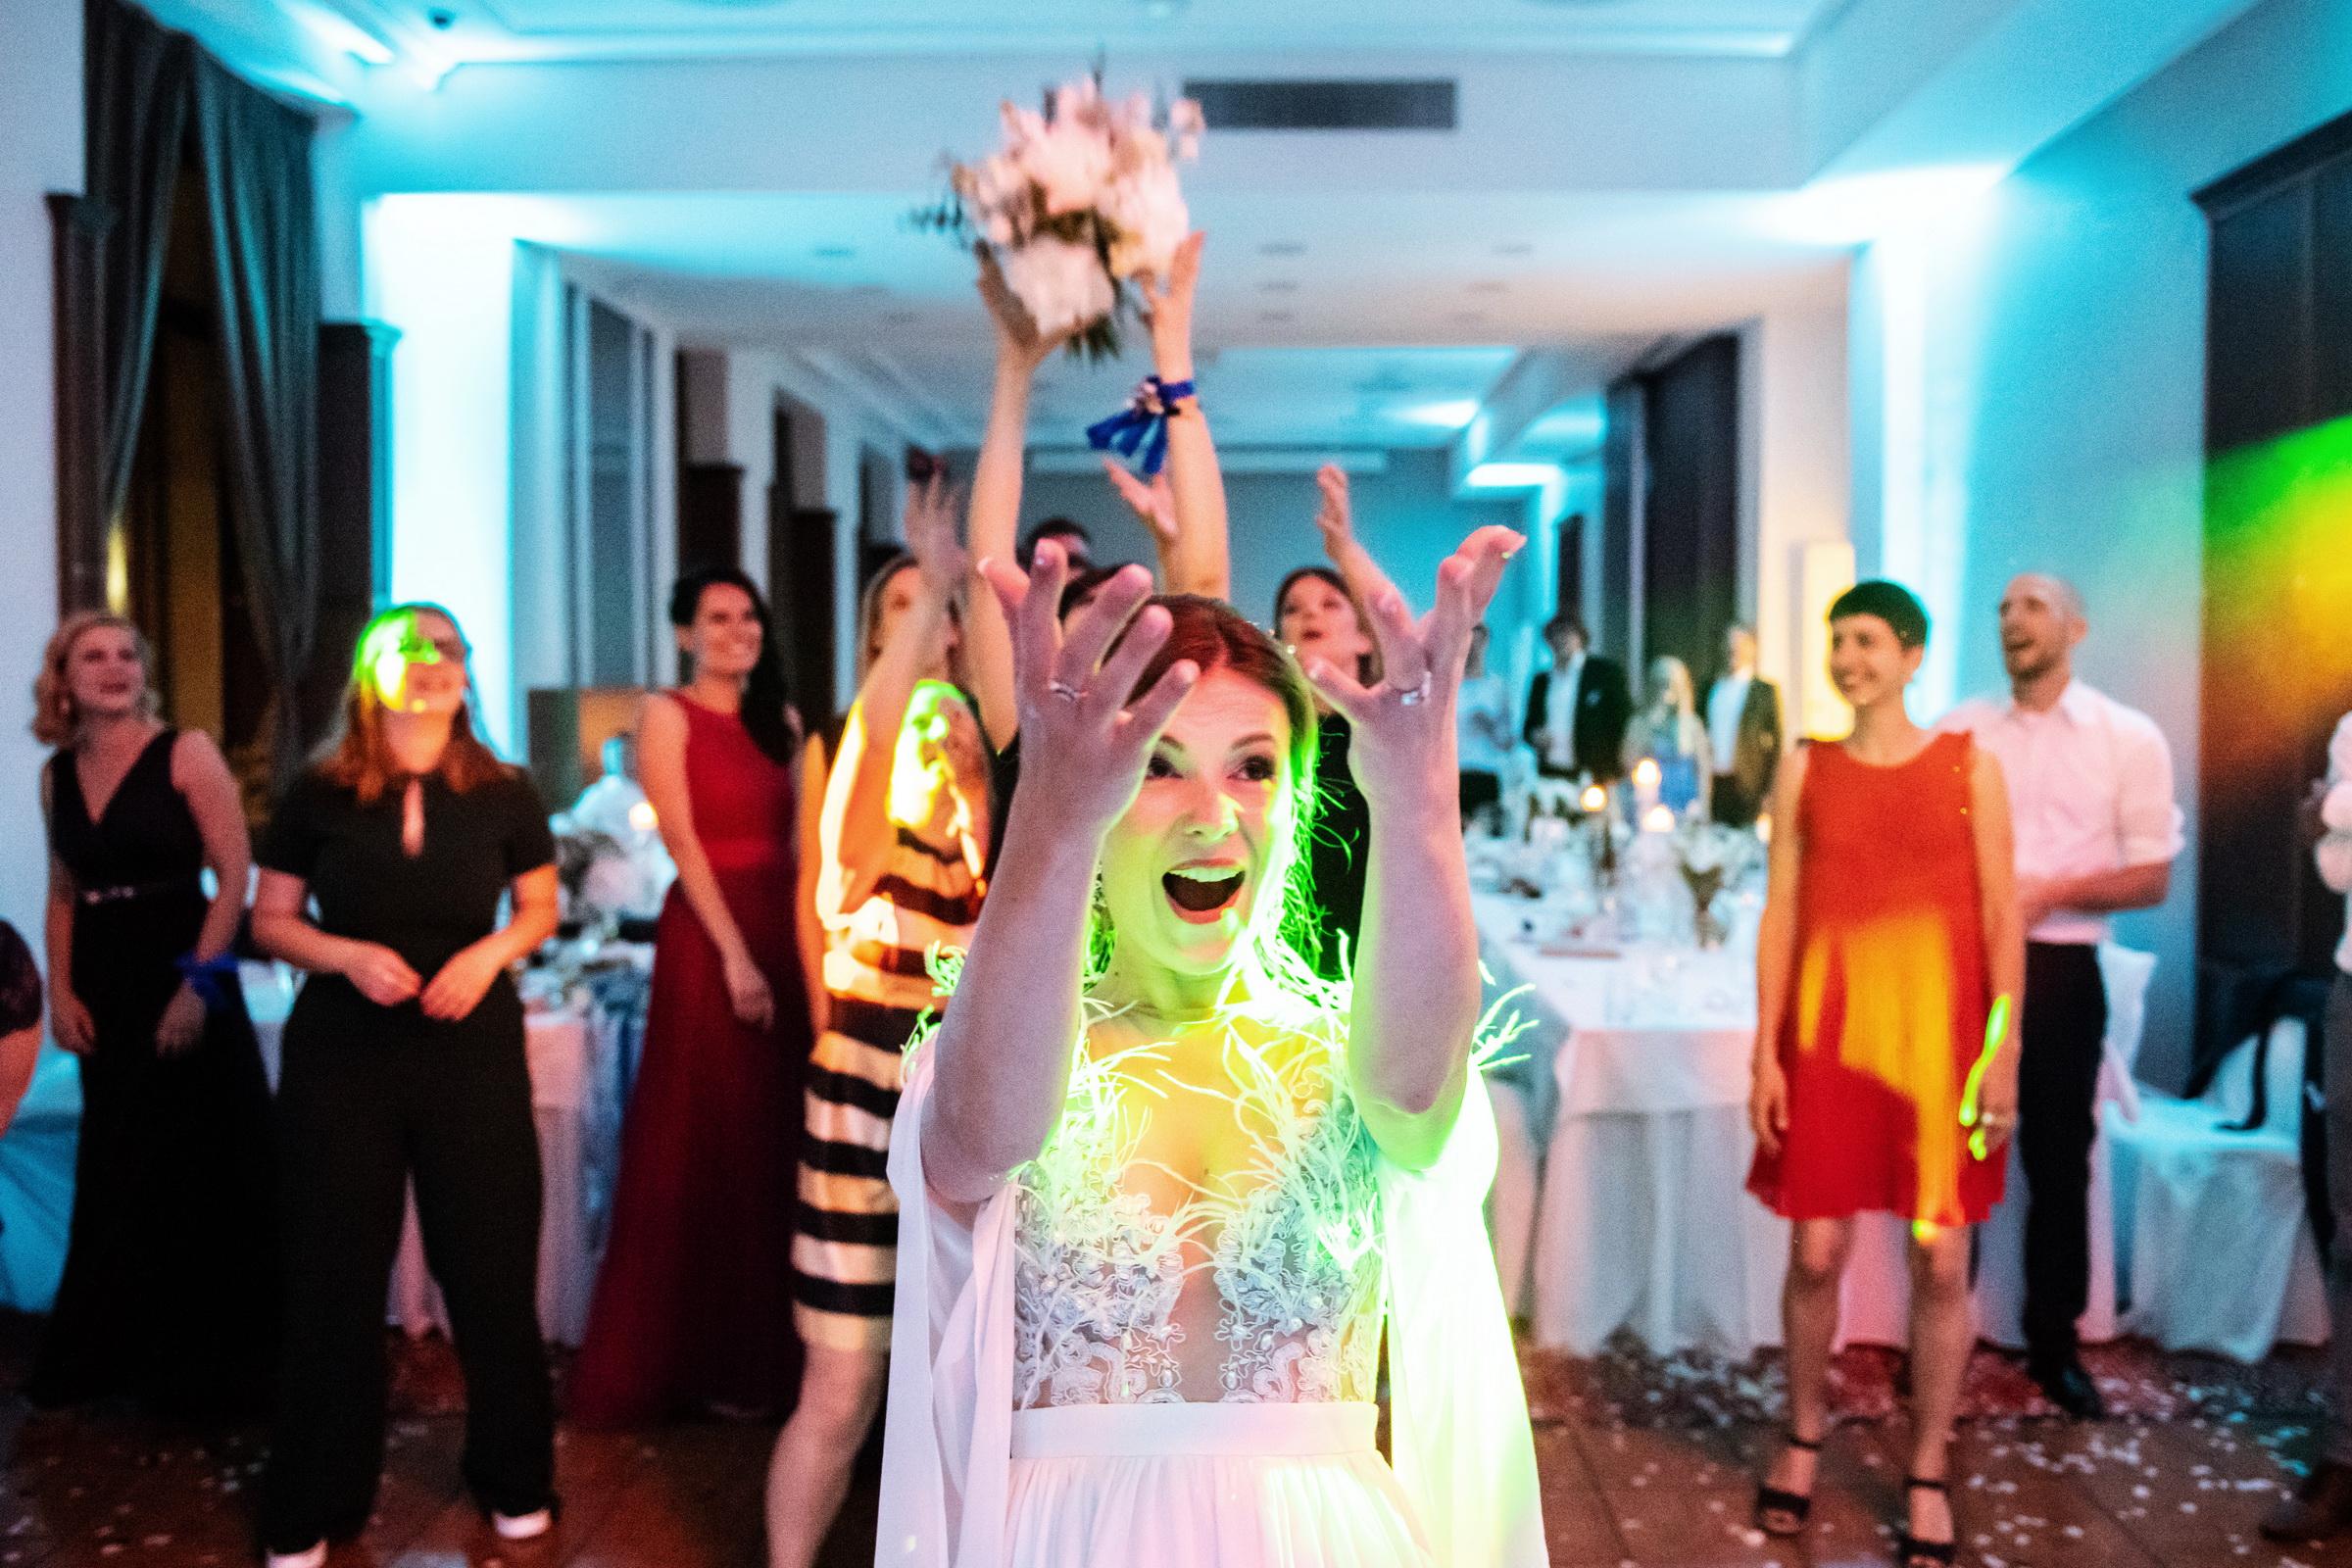 Svadba Hotel Elizabeth, Trenčín 05, #svadobnyDJ, #djanasvadbu, #svadba, #hotelelizabeth